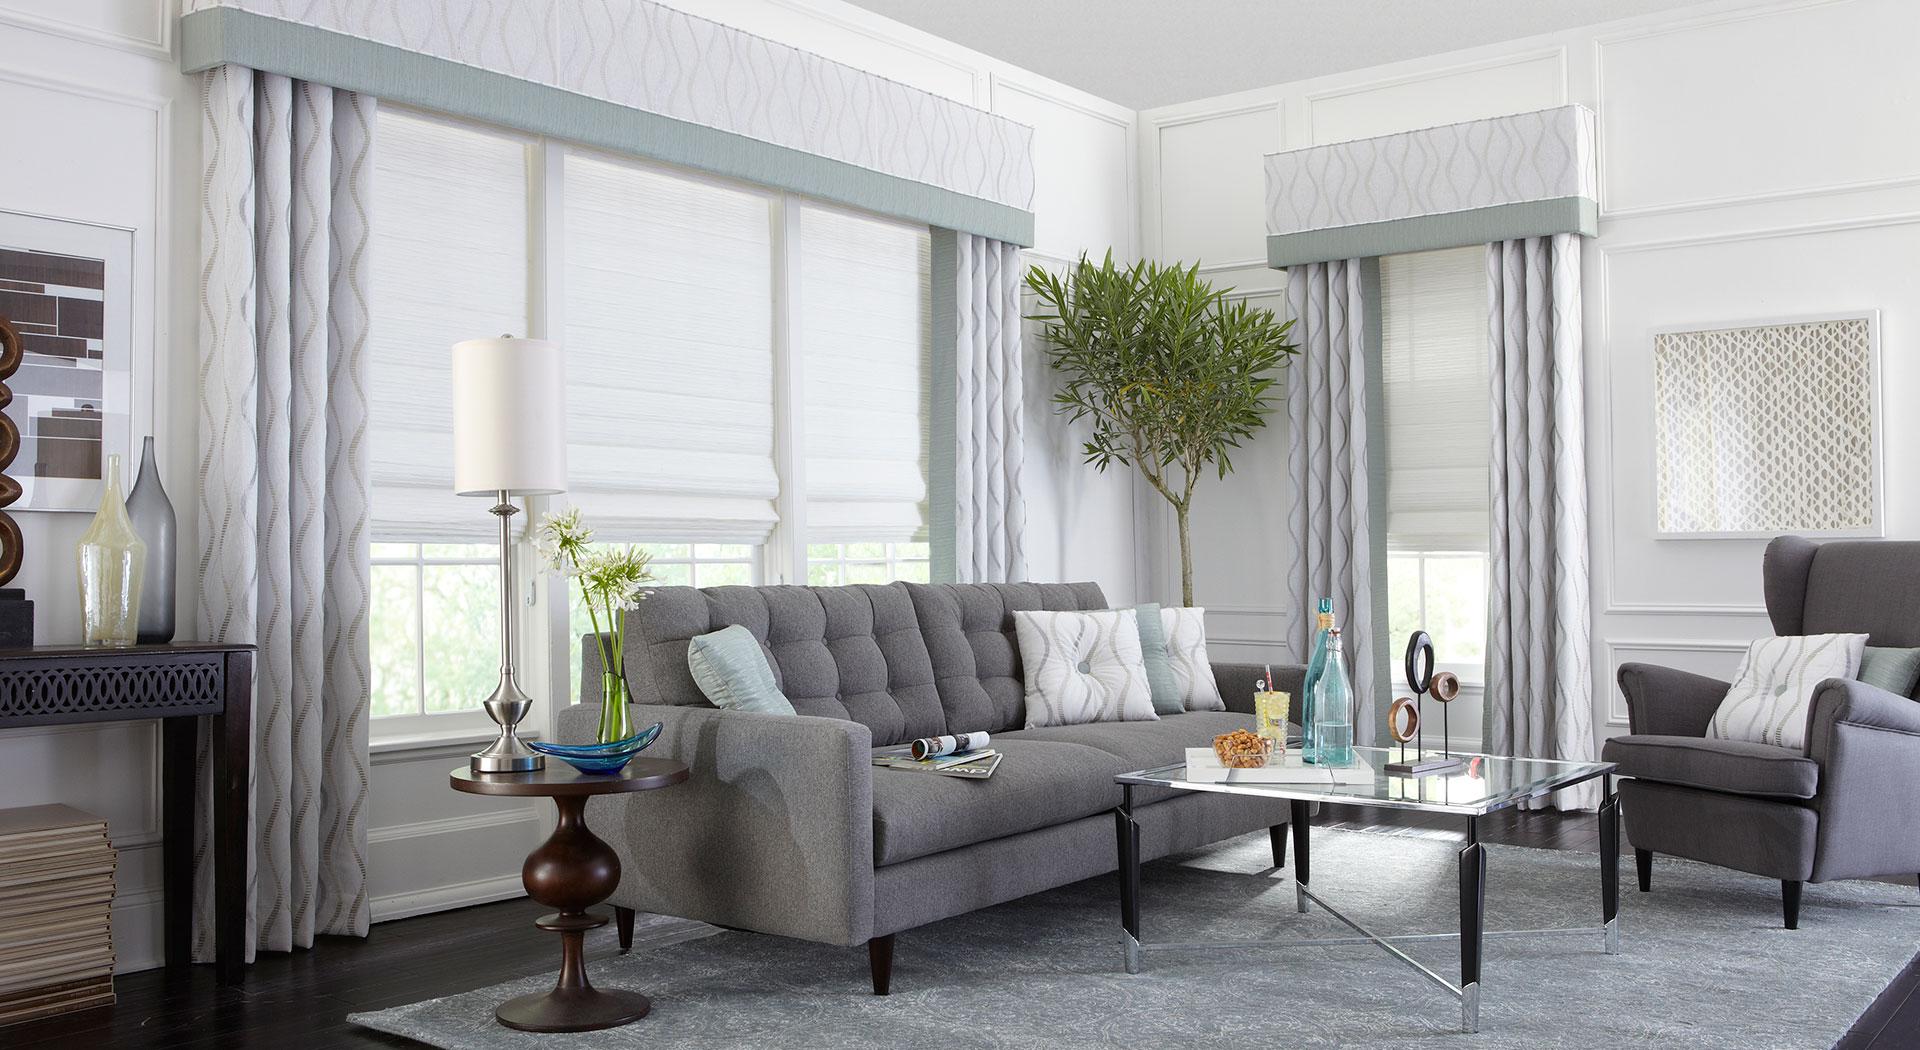 Solun Window Fashions & Automation